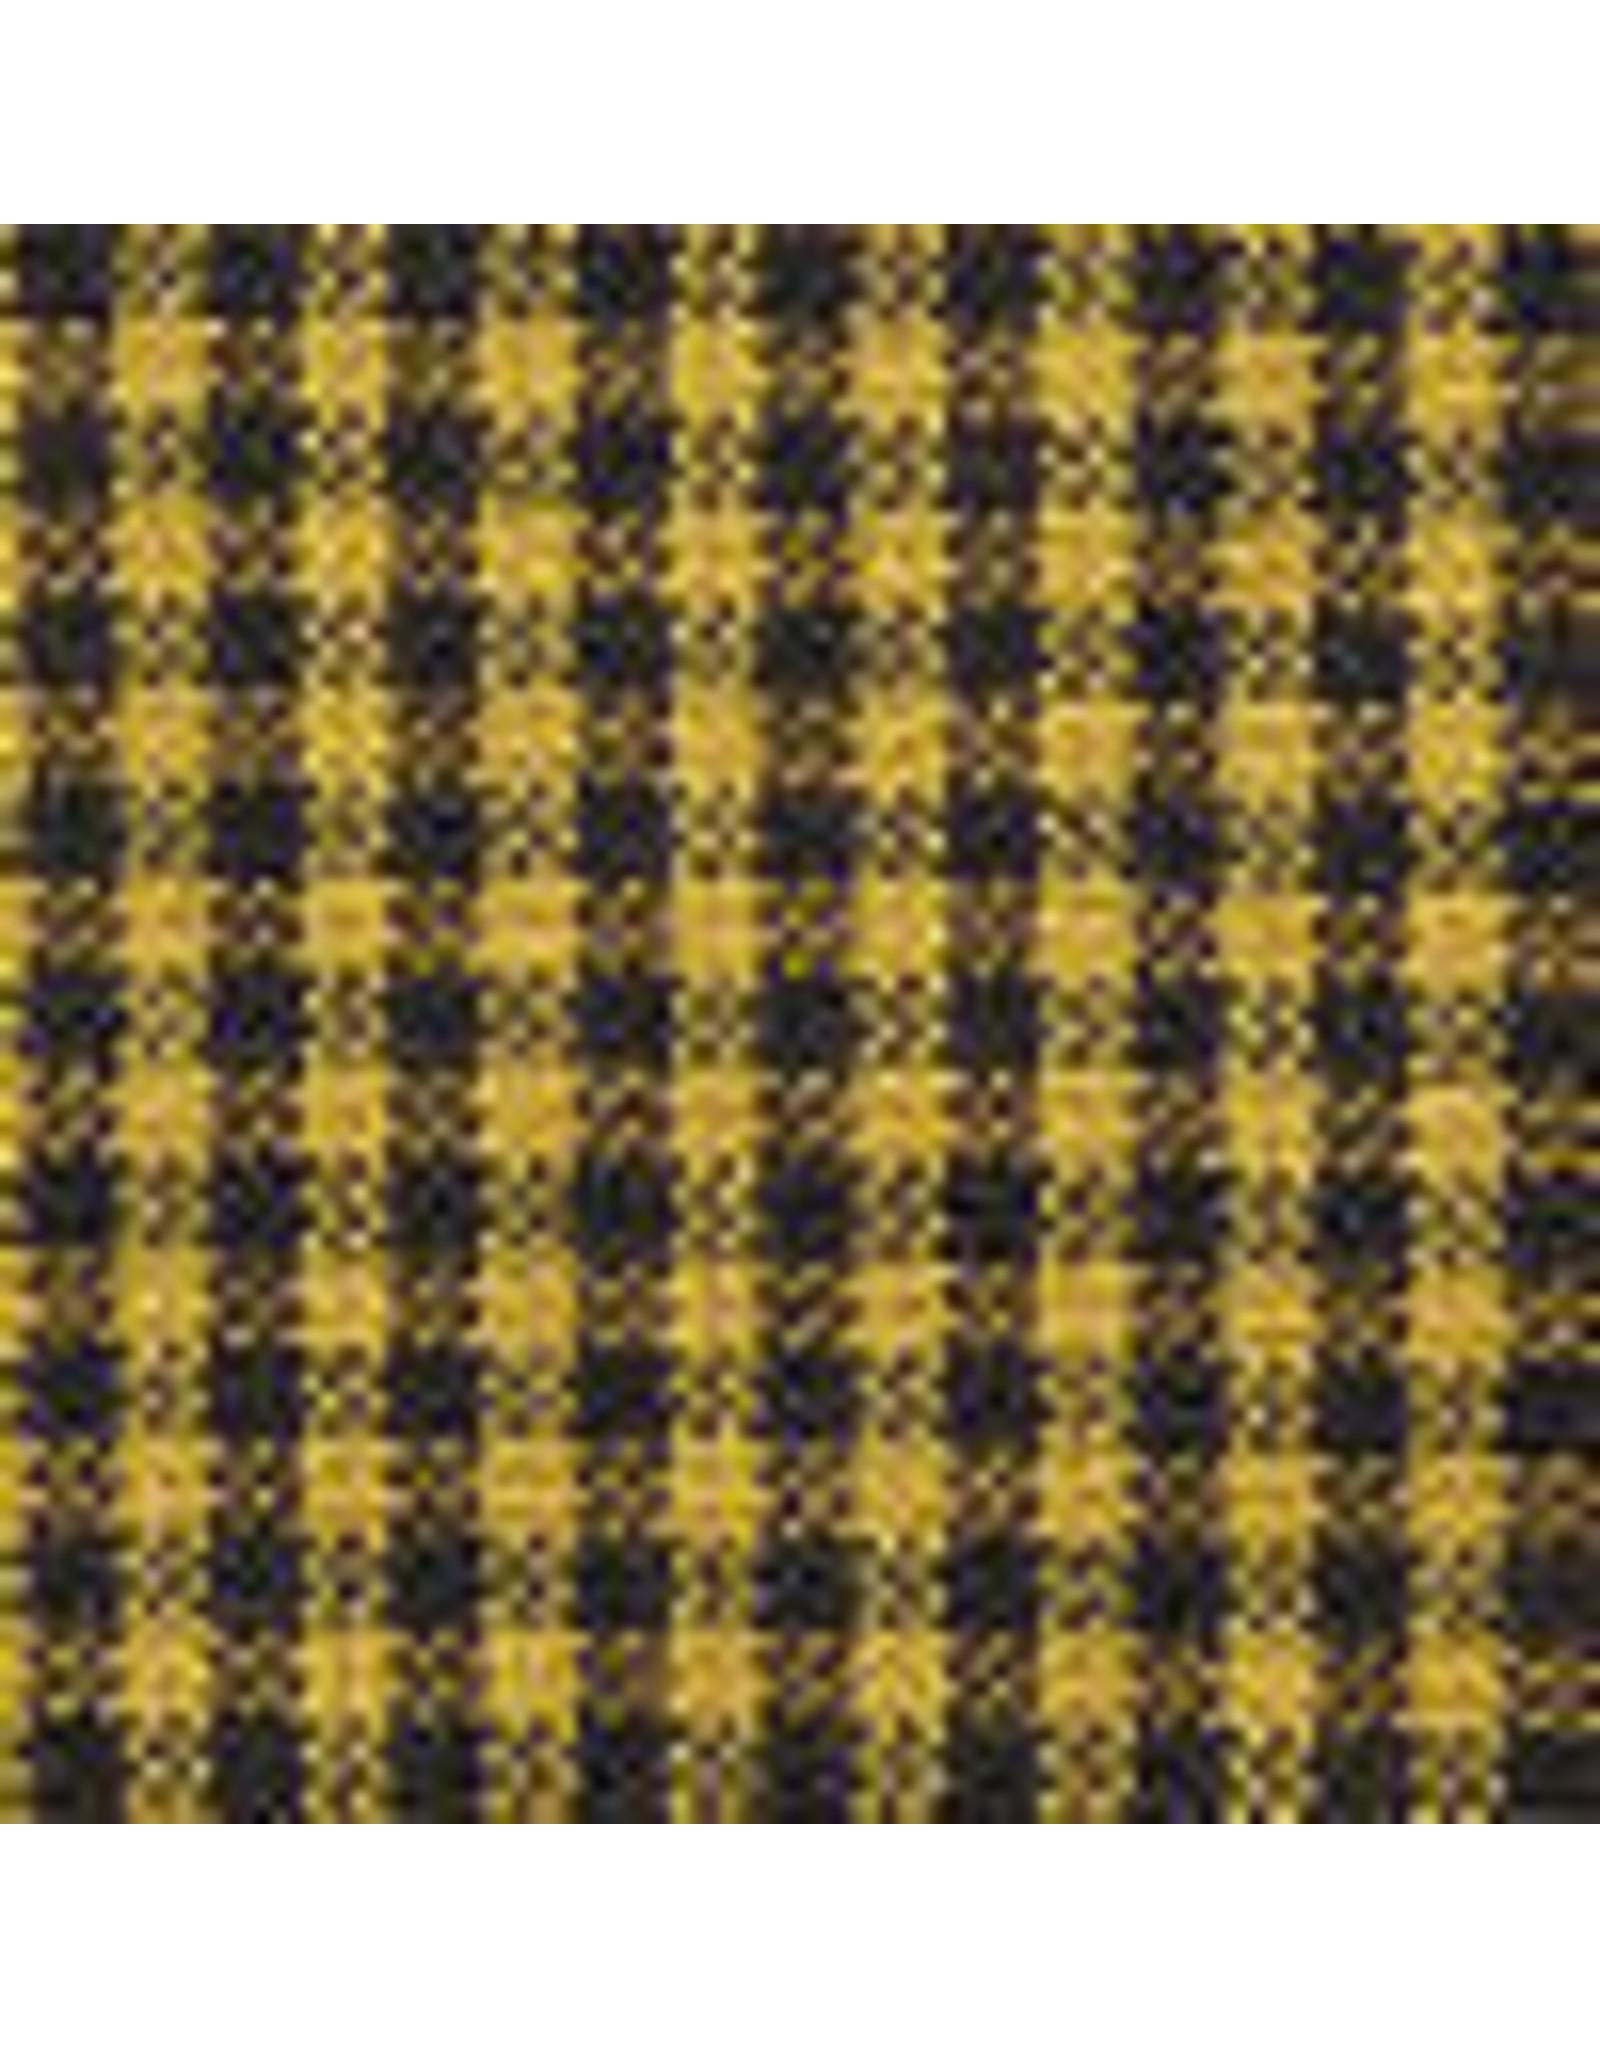 Yd. Mustard and Black Mini Check Fabric #73